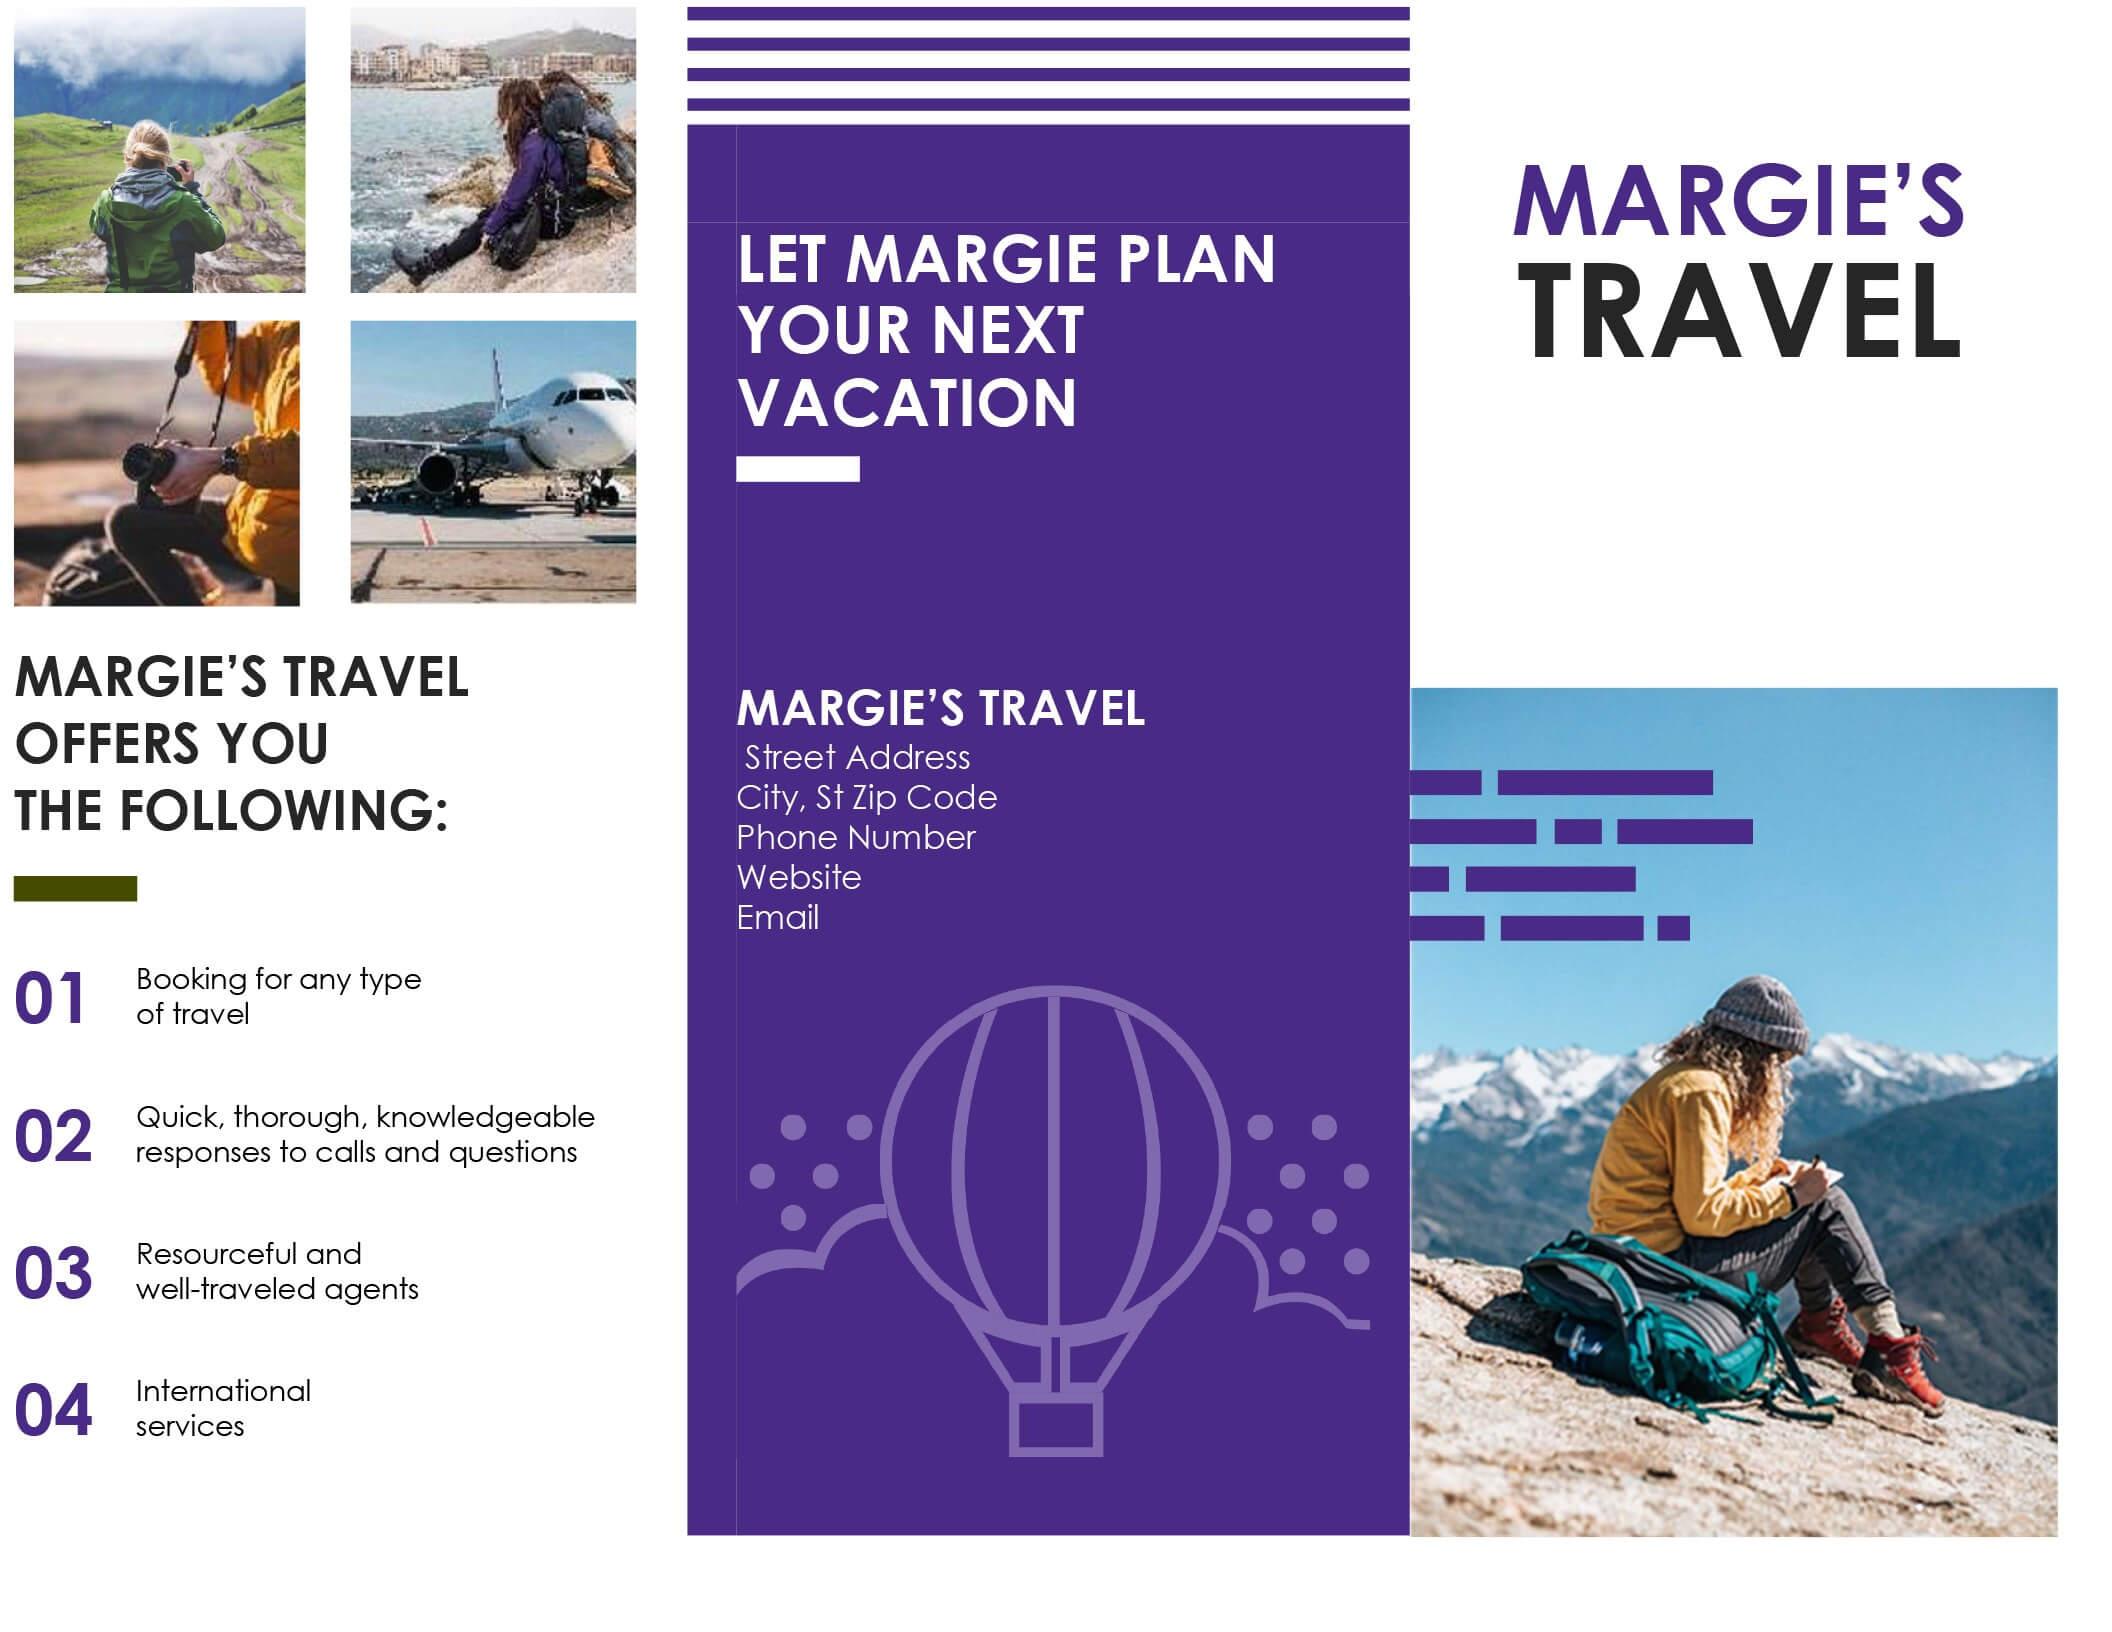 005 Template Ideas Travel Brochure Templates Free Download With Regard To Word Travel Brochure Template